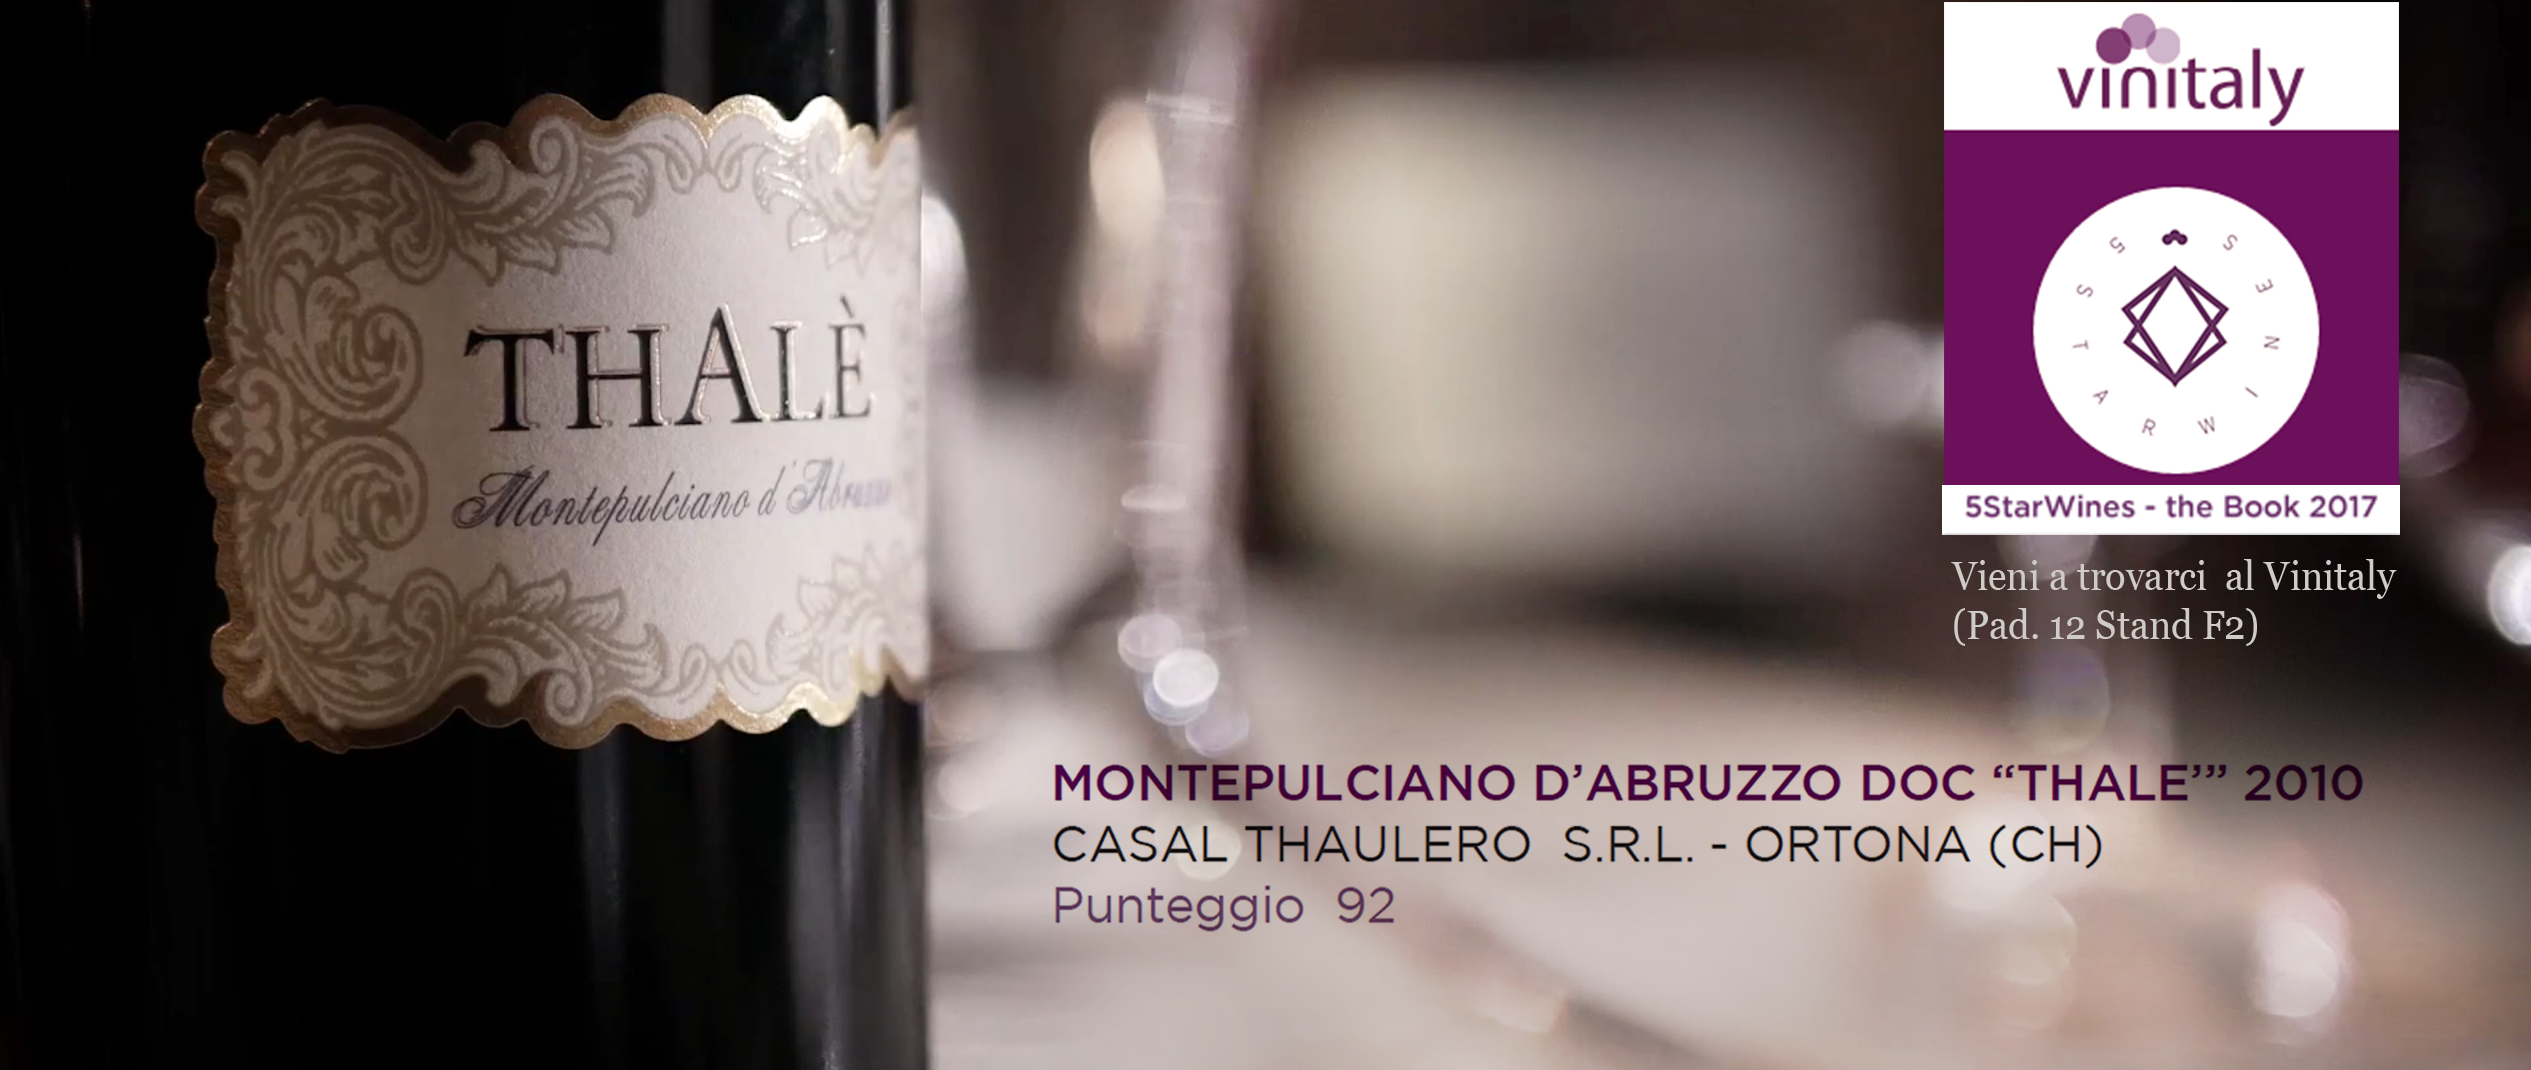 vinitaly 2017 5Stars Wines thalè Montepulciano